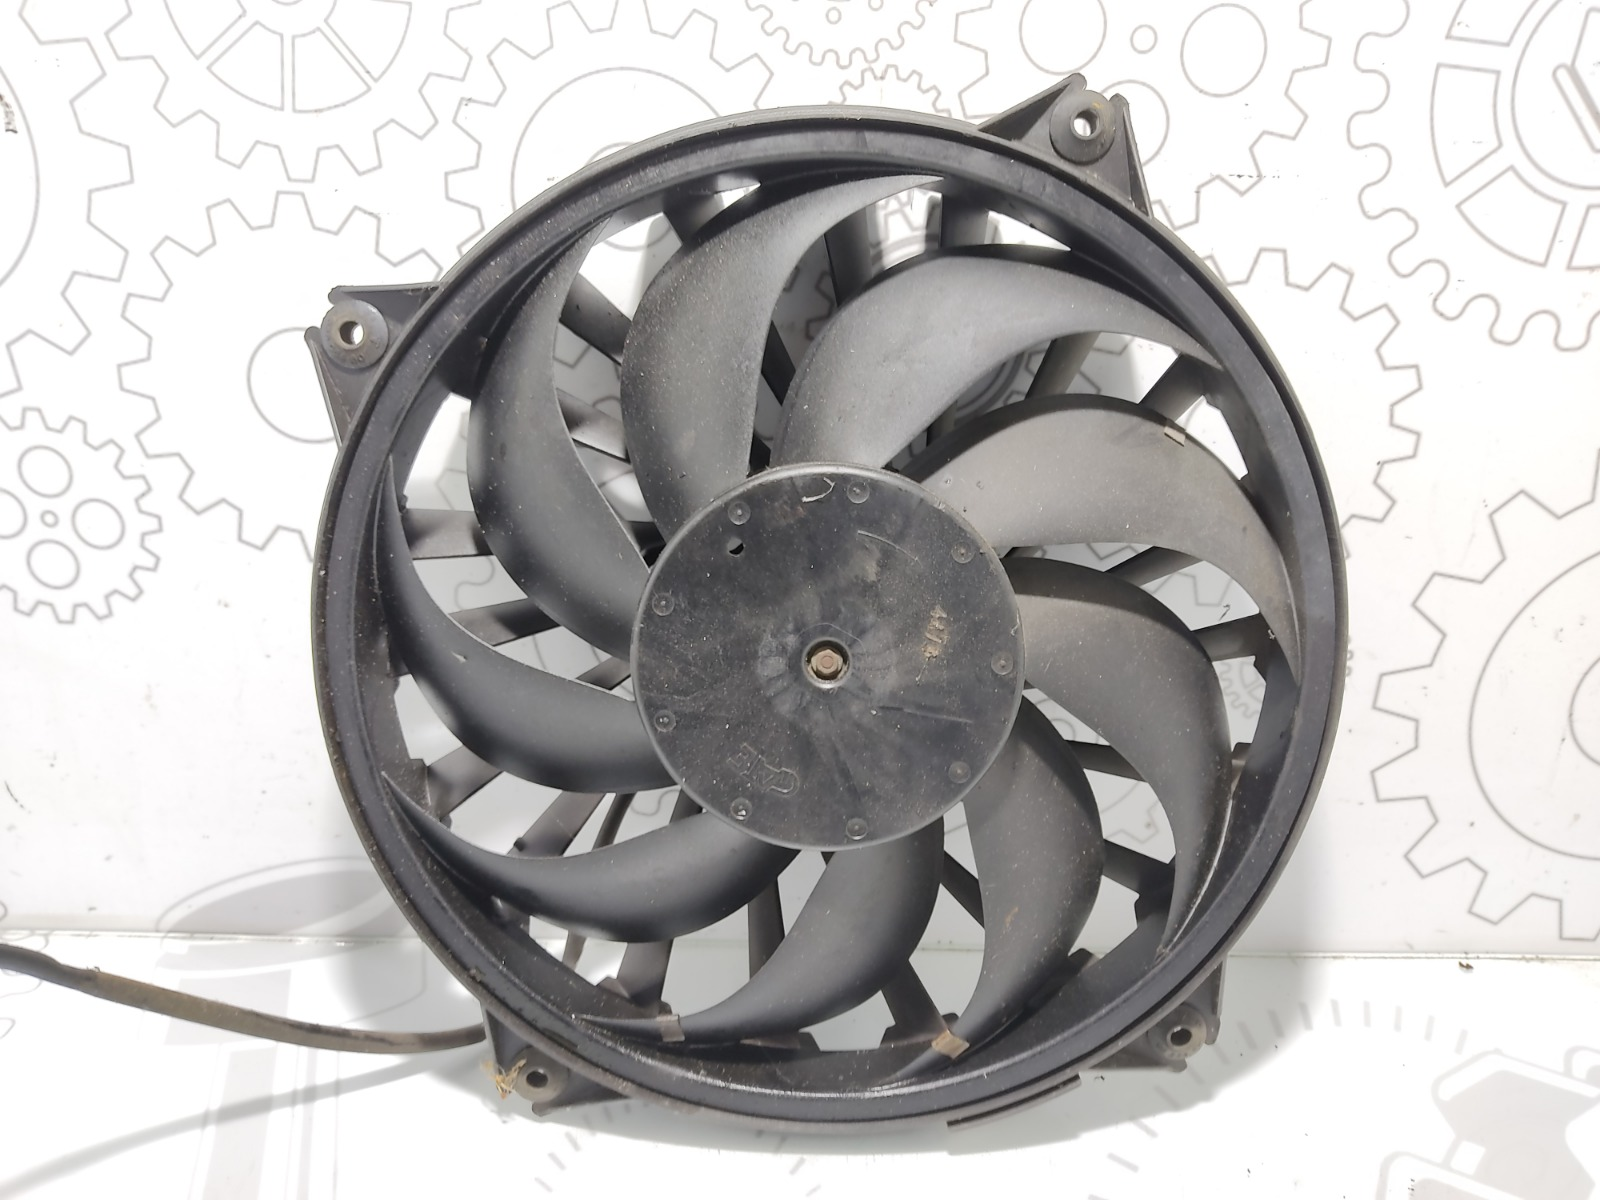 Вентилятор радиатора Fiat Ulysse 2.0 I 2005 (б/у)